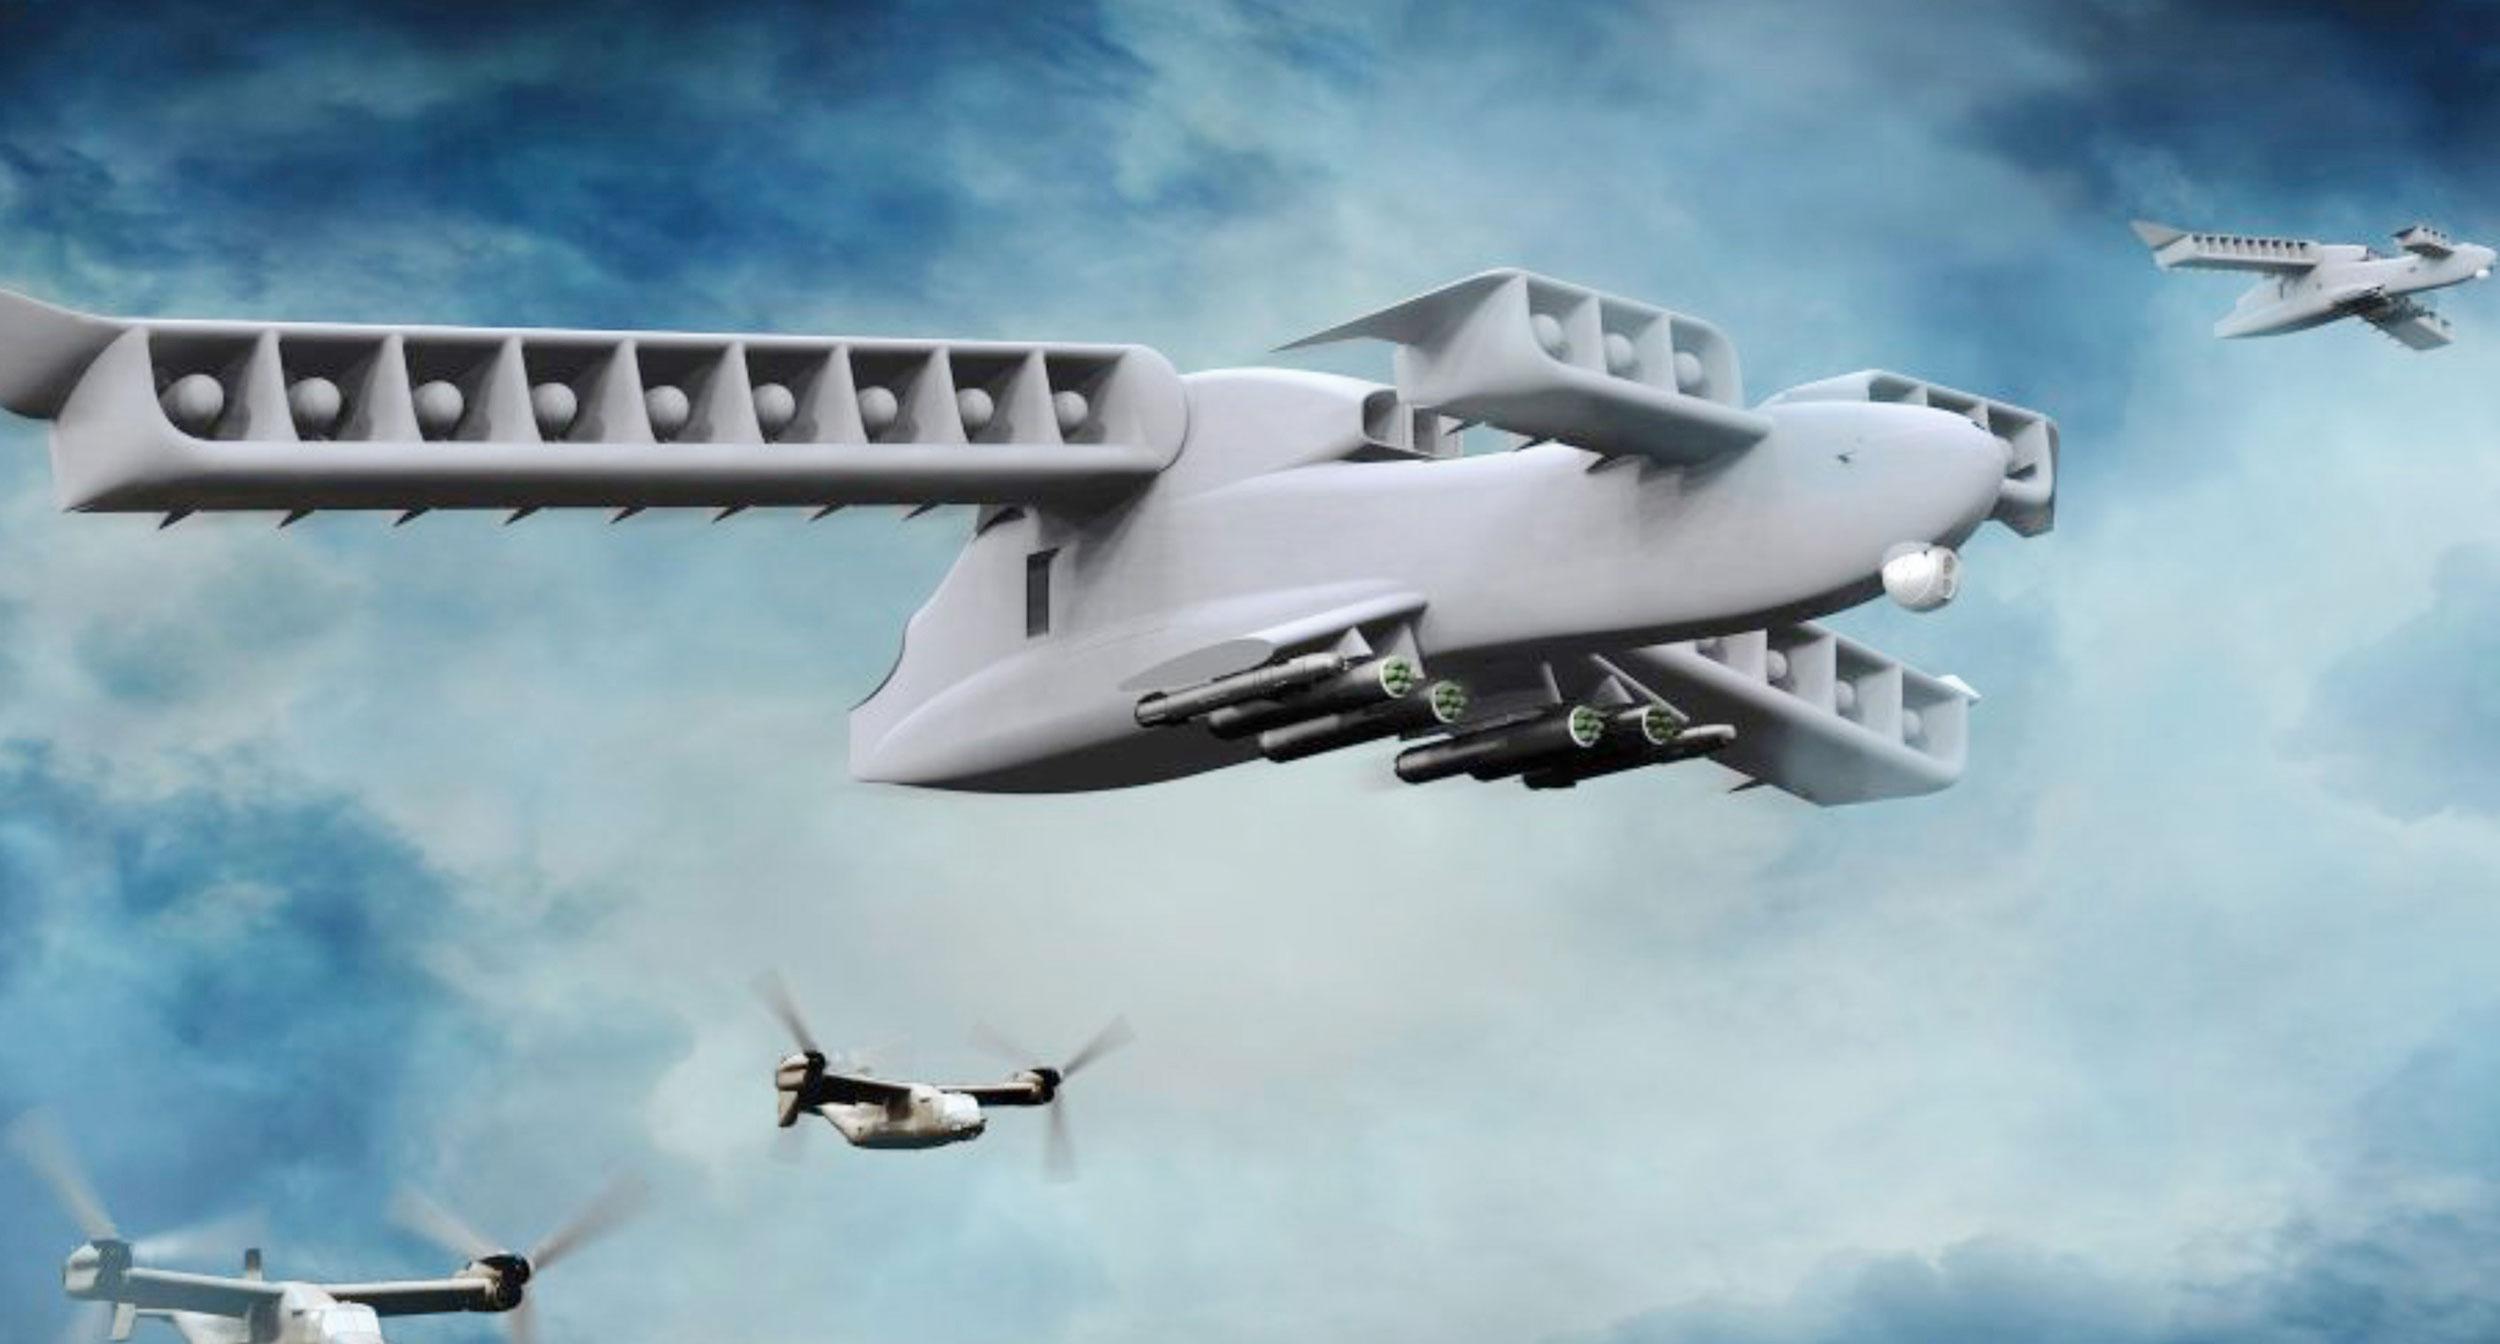 File:Aurora LightningStrike aircraft concept.jpg ...